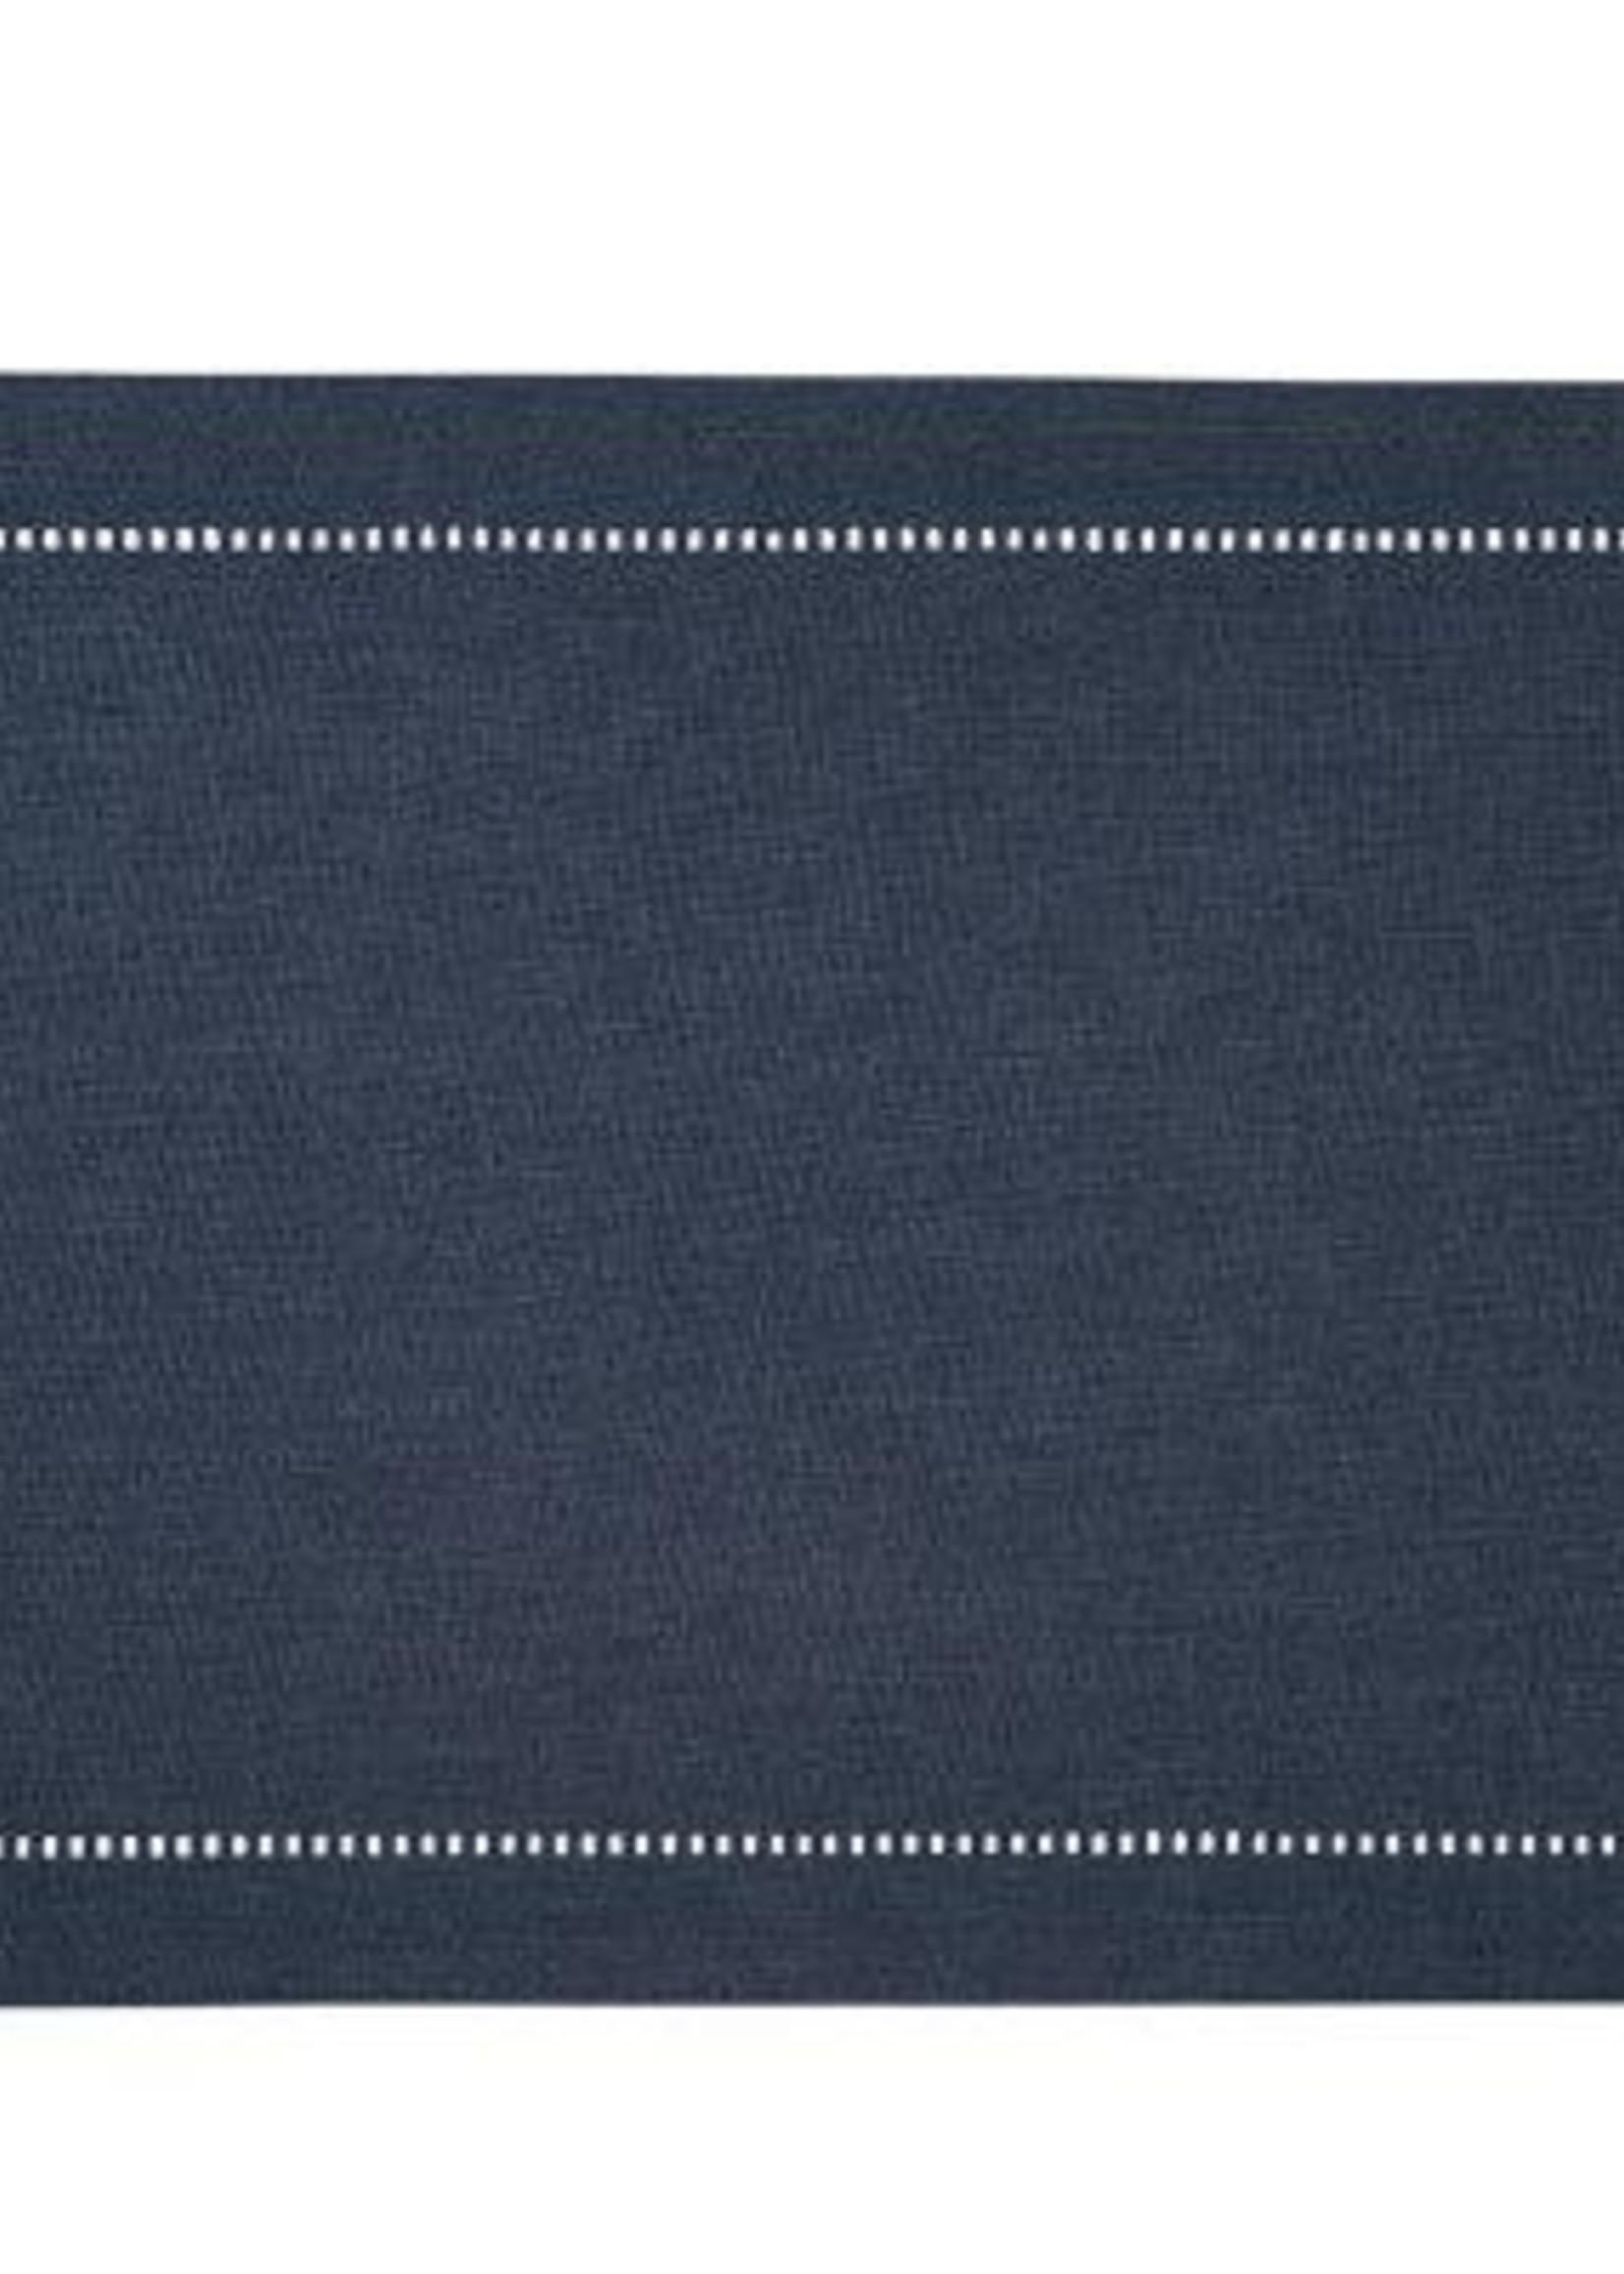 Harman Elite Vinyl Placemat Navy